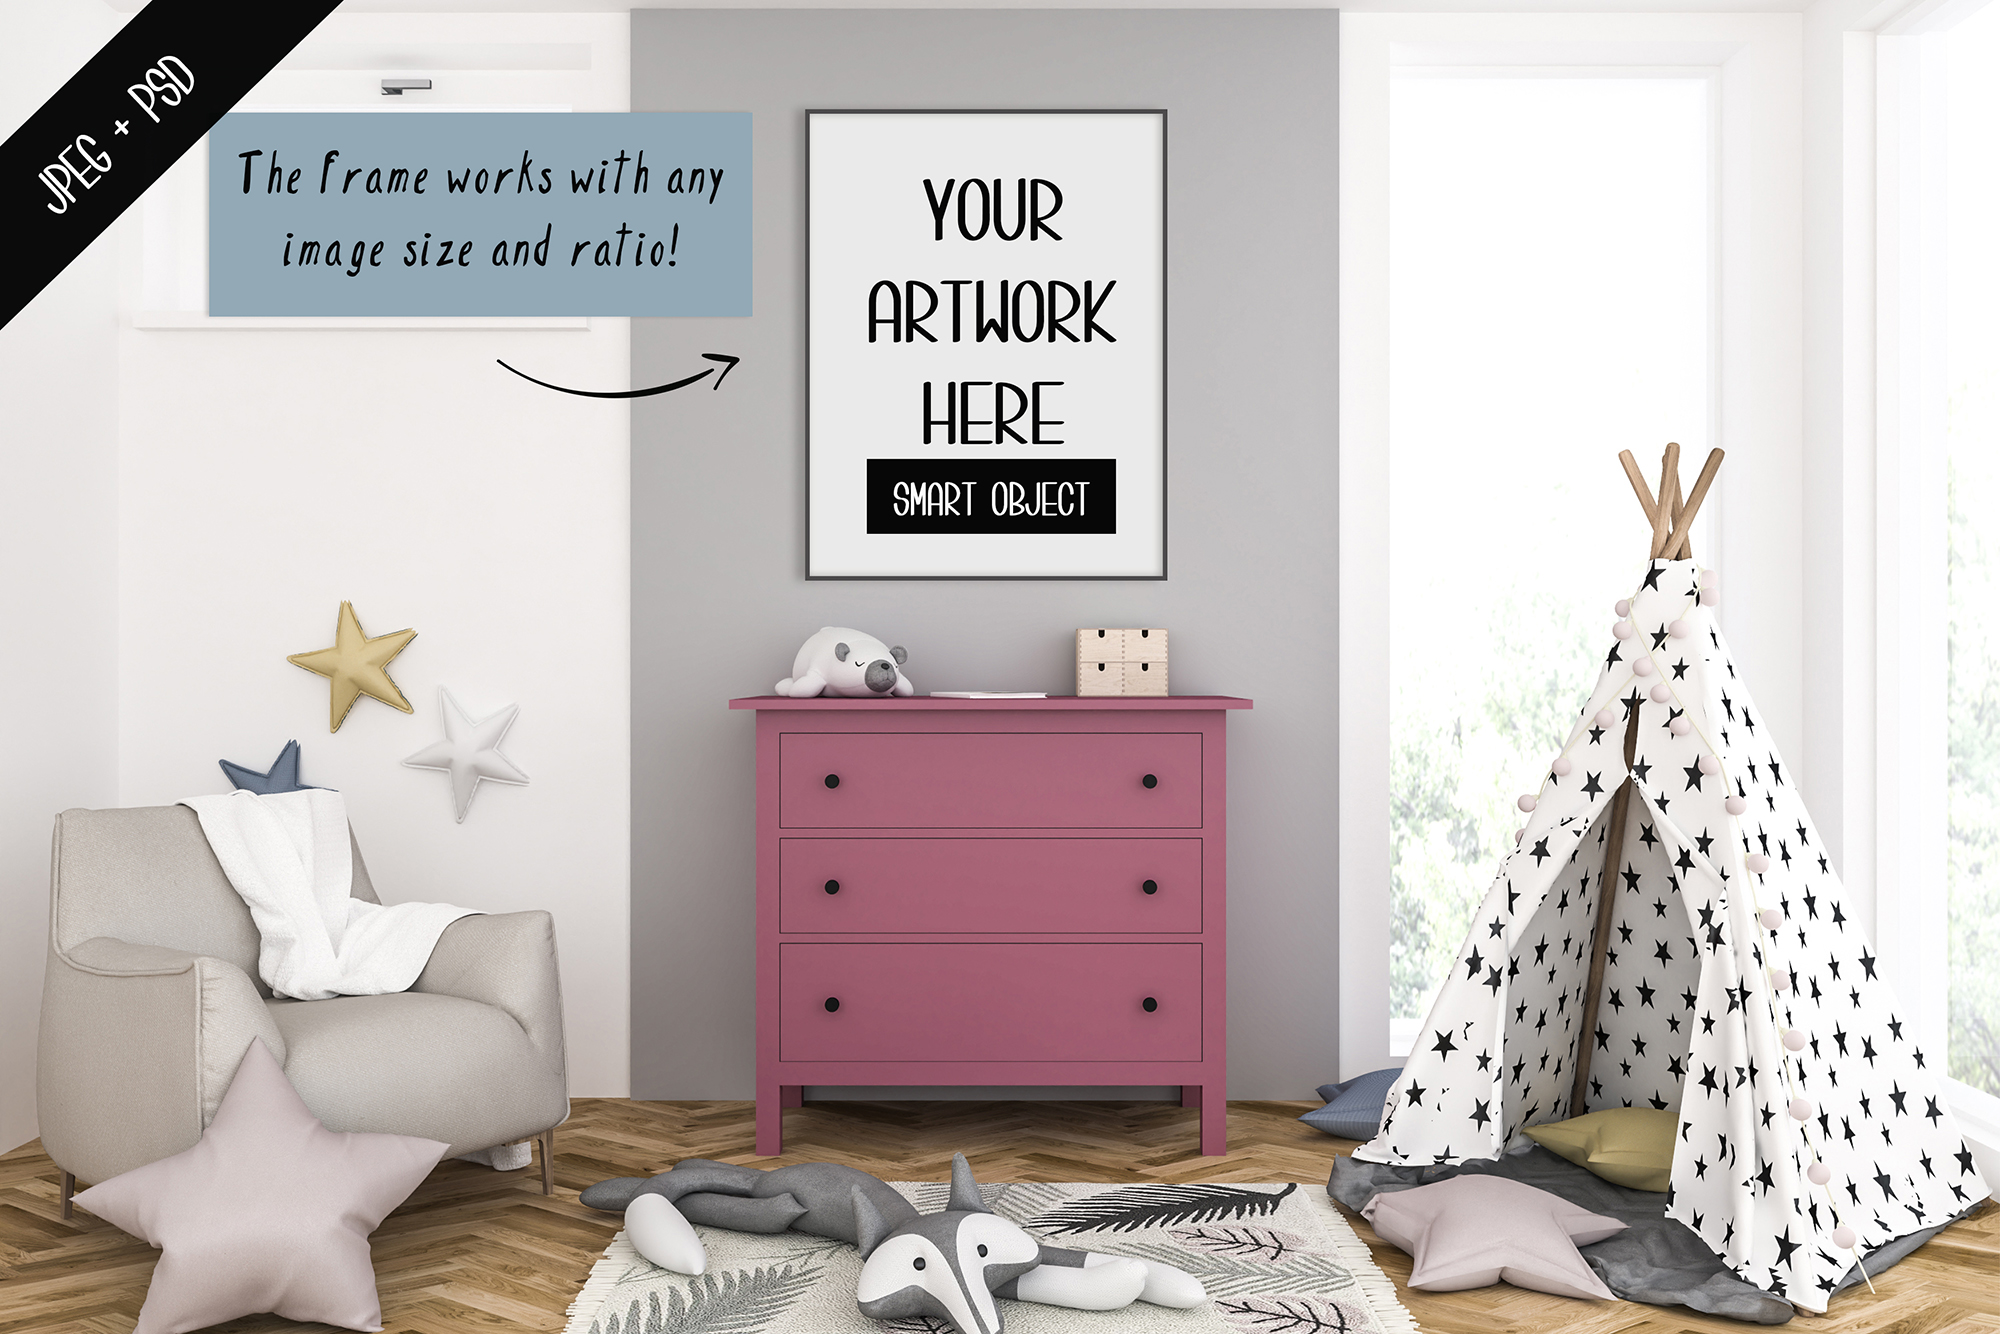 Frame mockup creator - All image size - Interior mockup example image 2